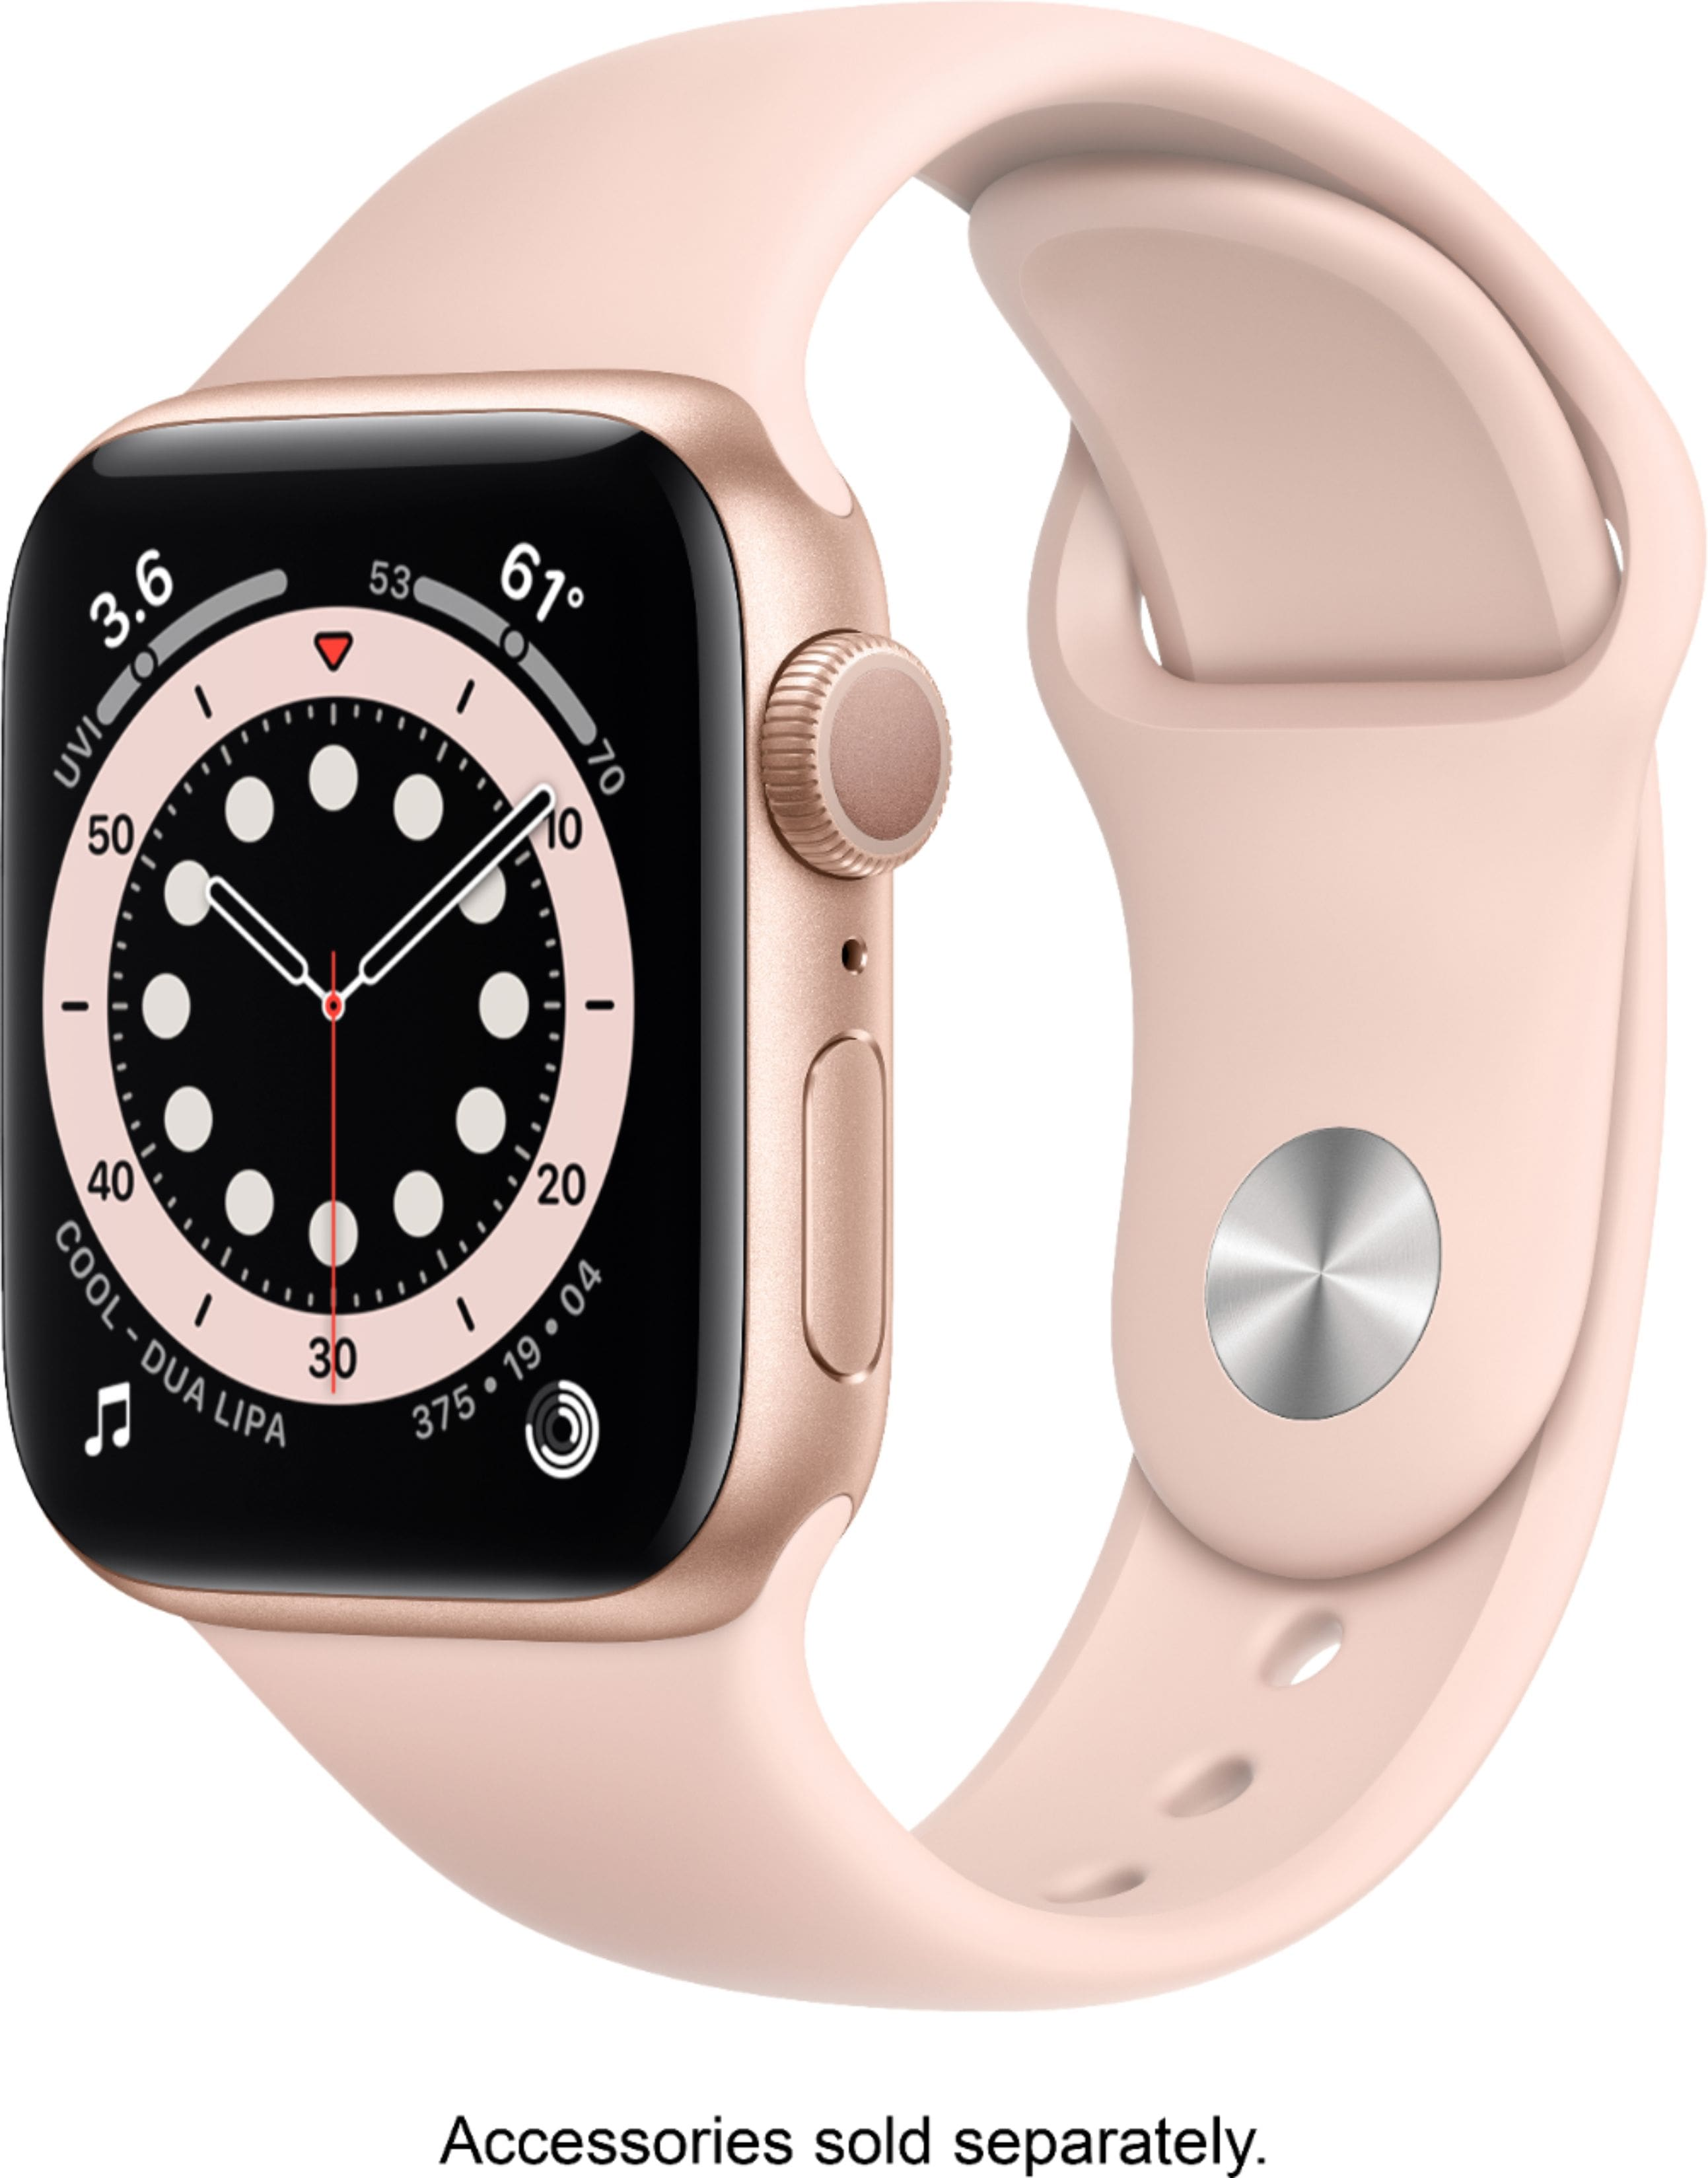 Apple Watch Series 6 40MM GPS (Choose Color) - Sam's Club $329.00